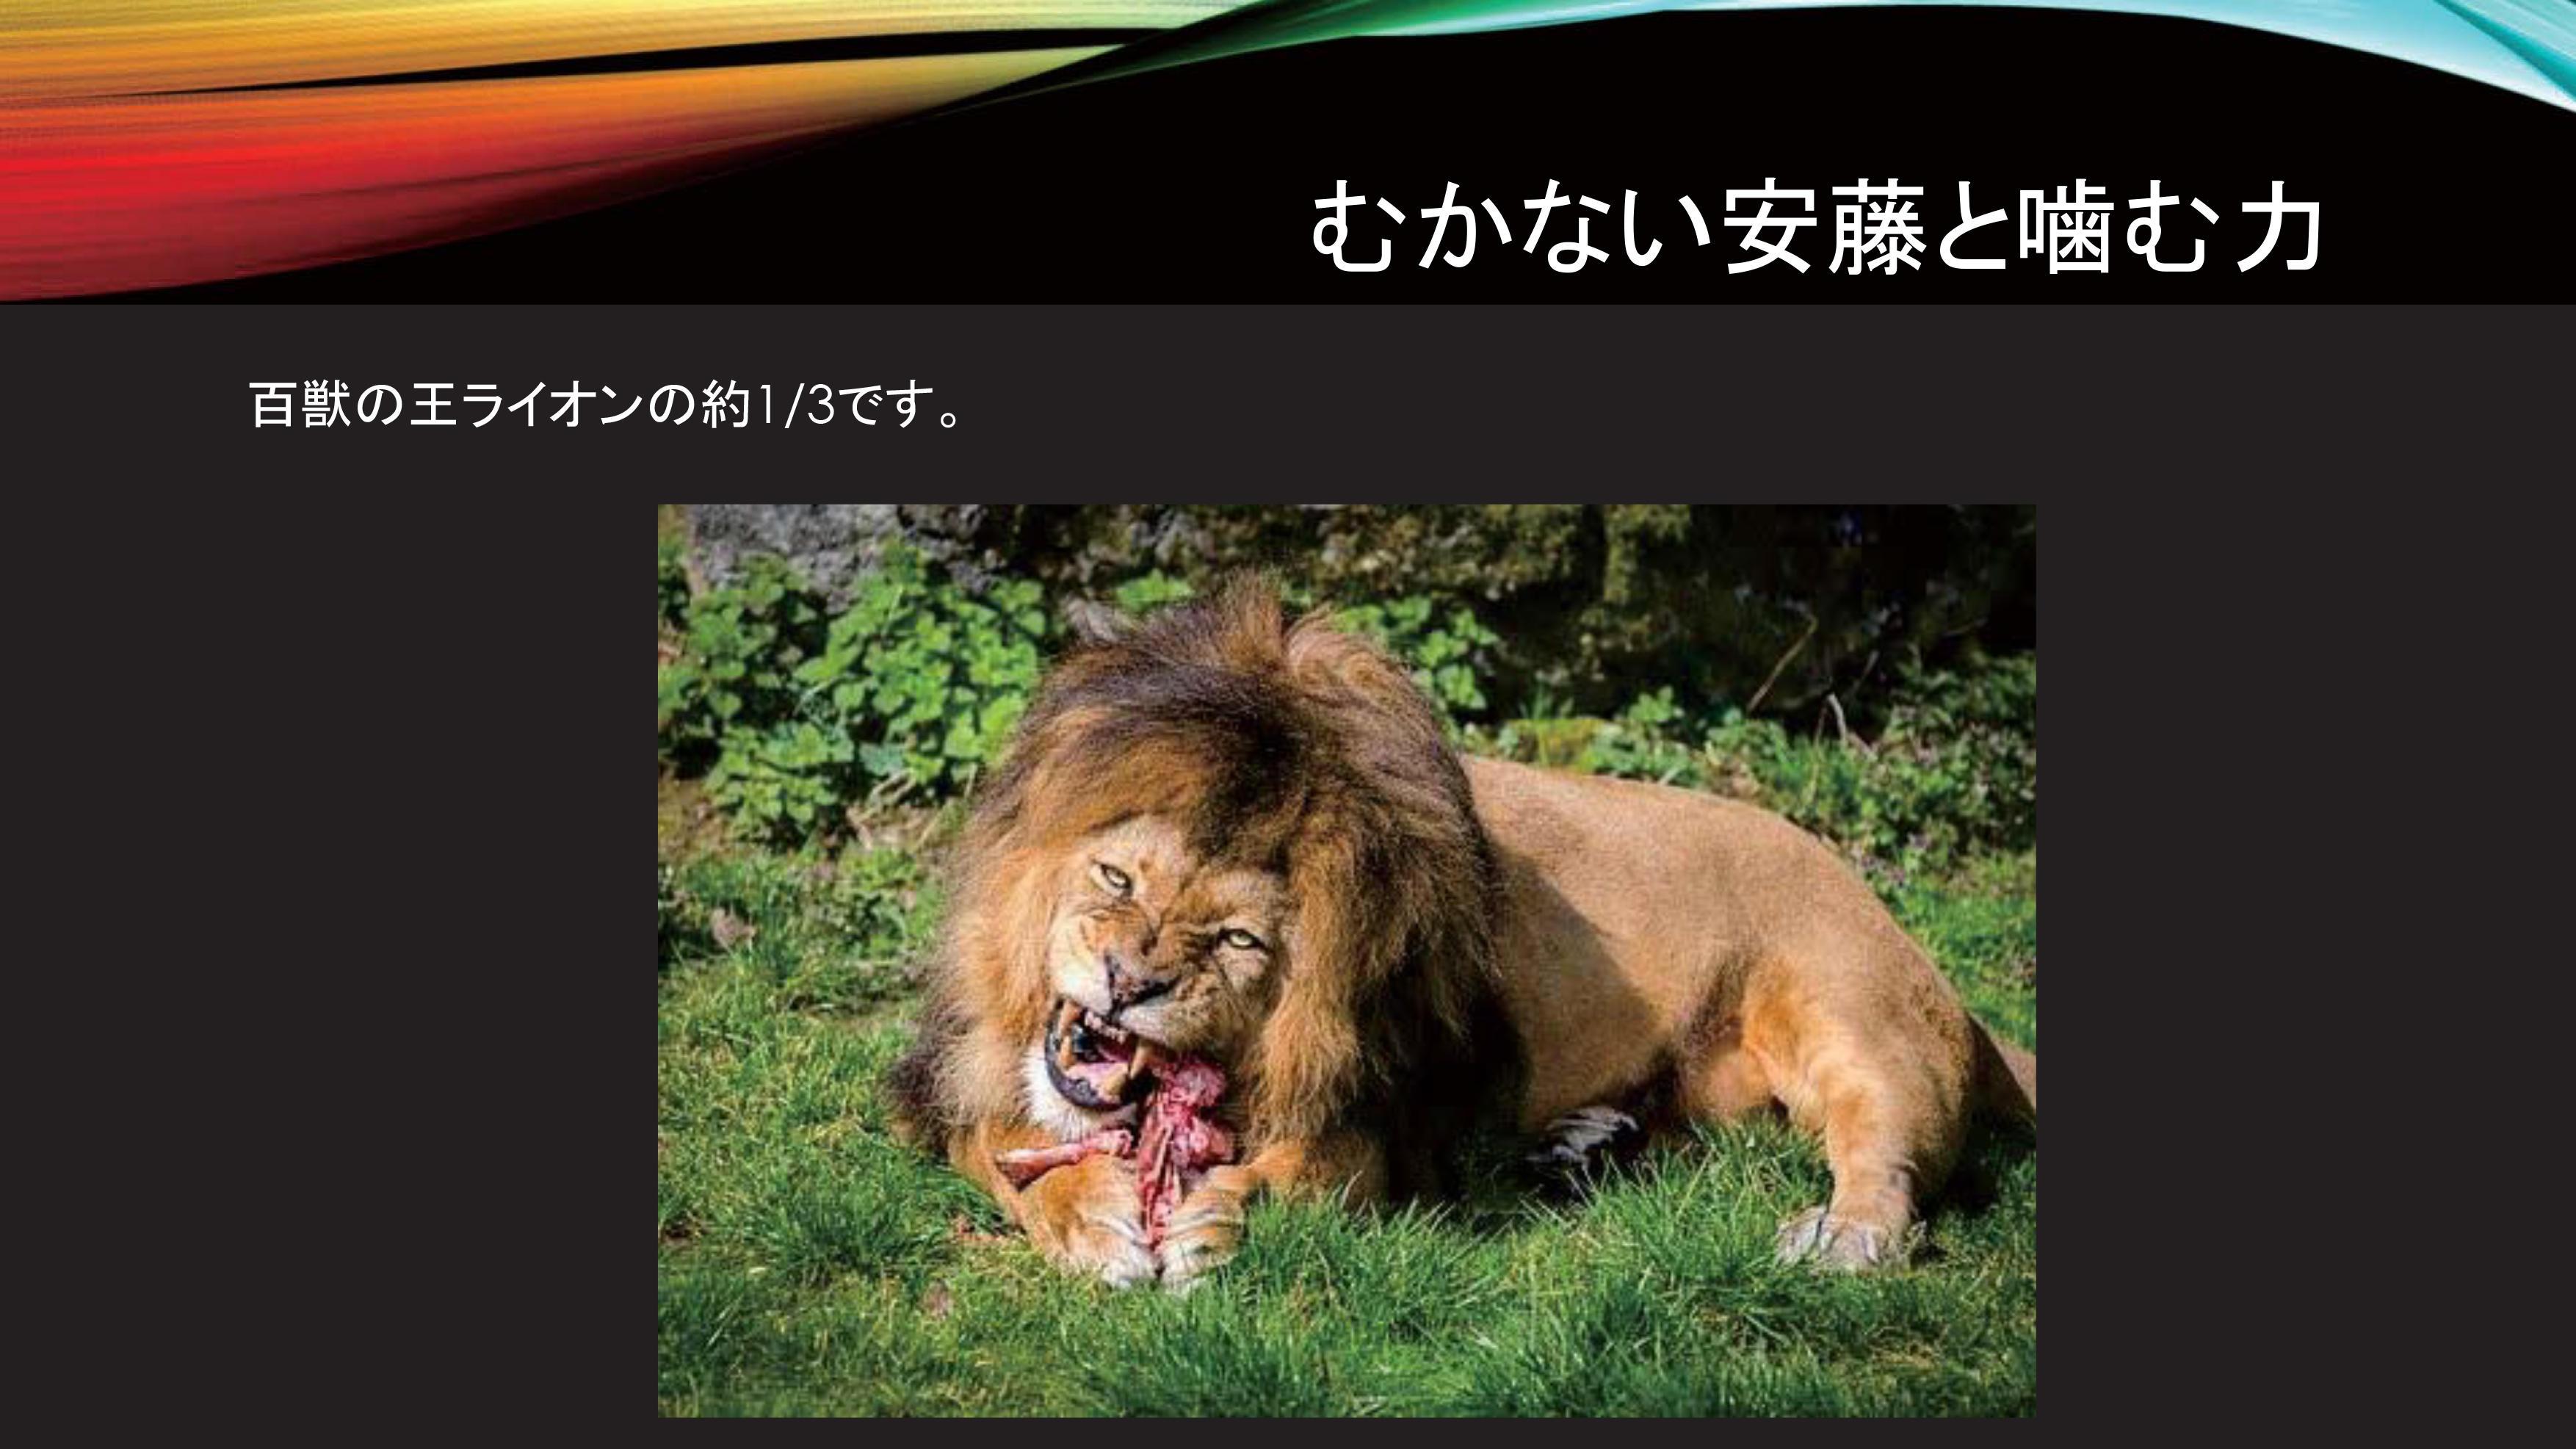 mukanaiando_lion.jpg